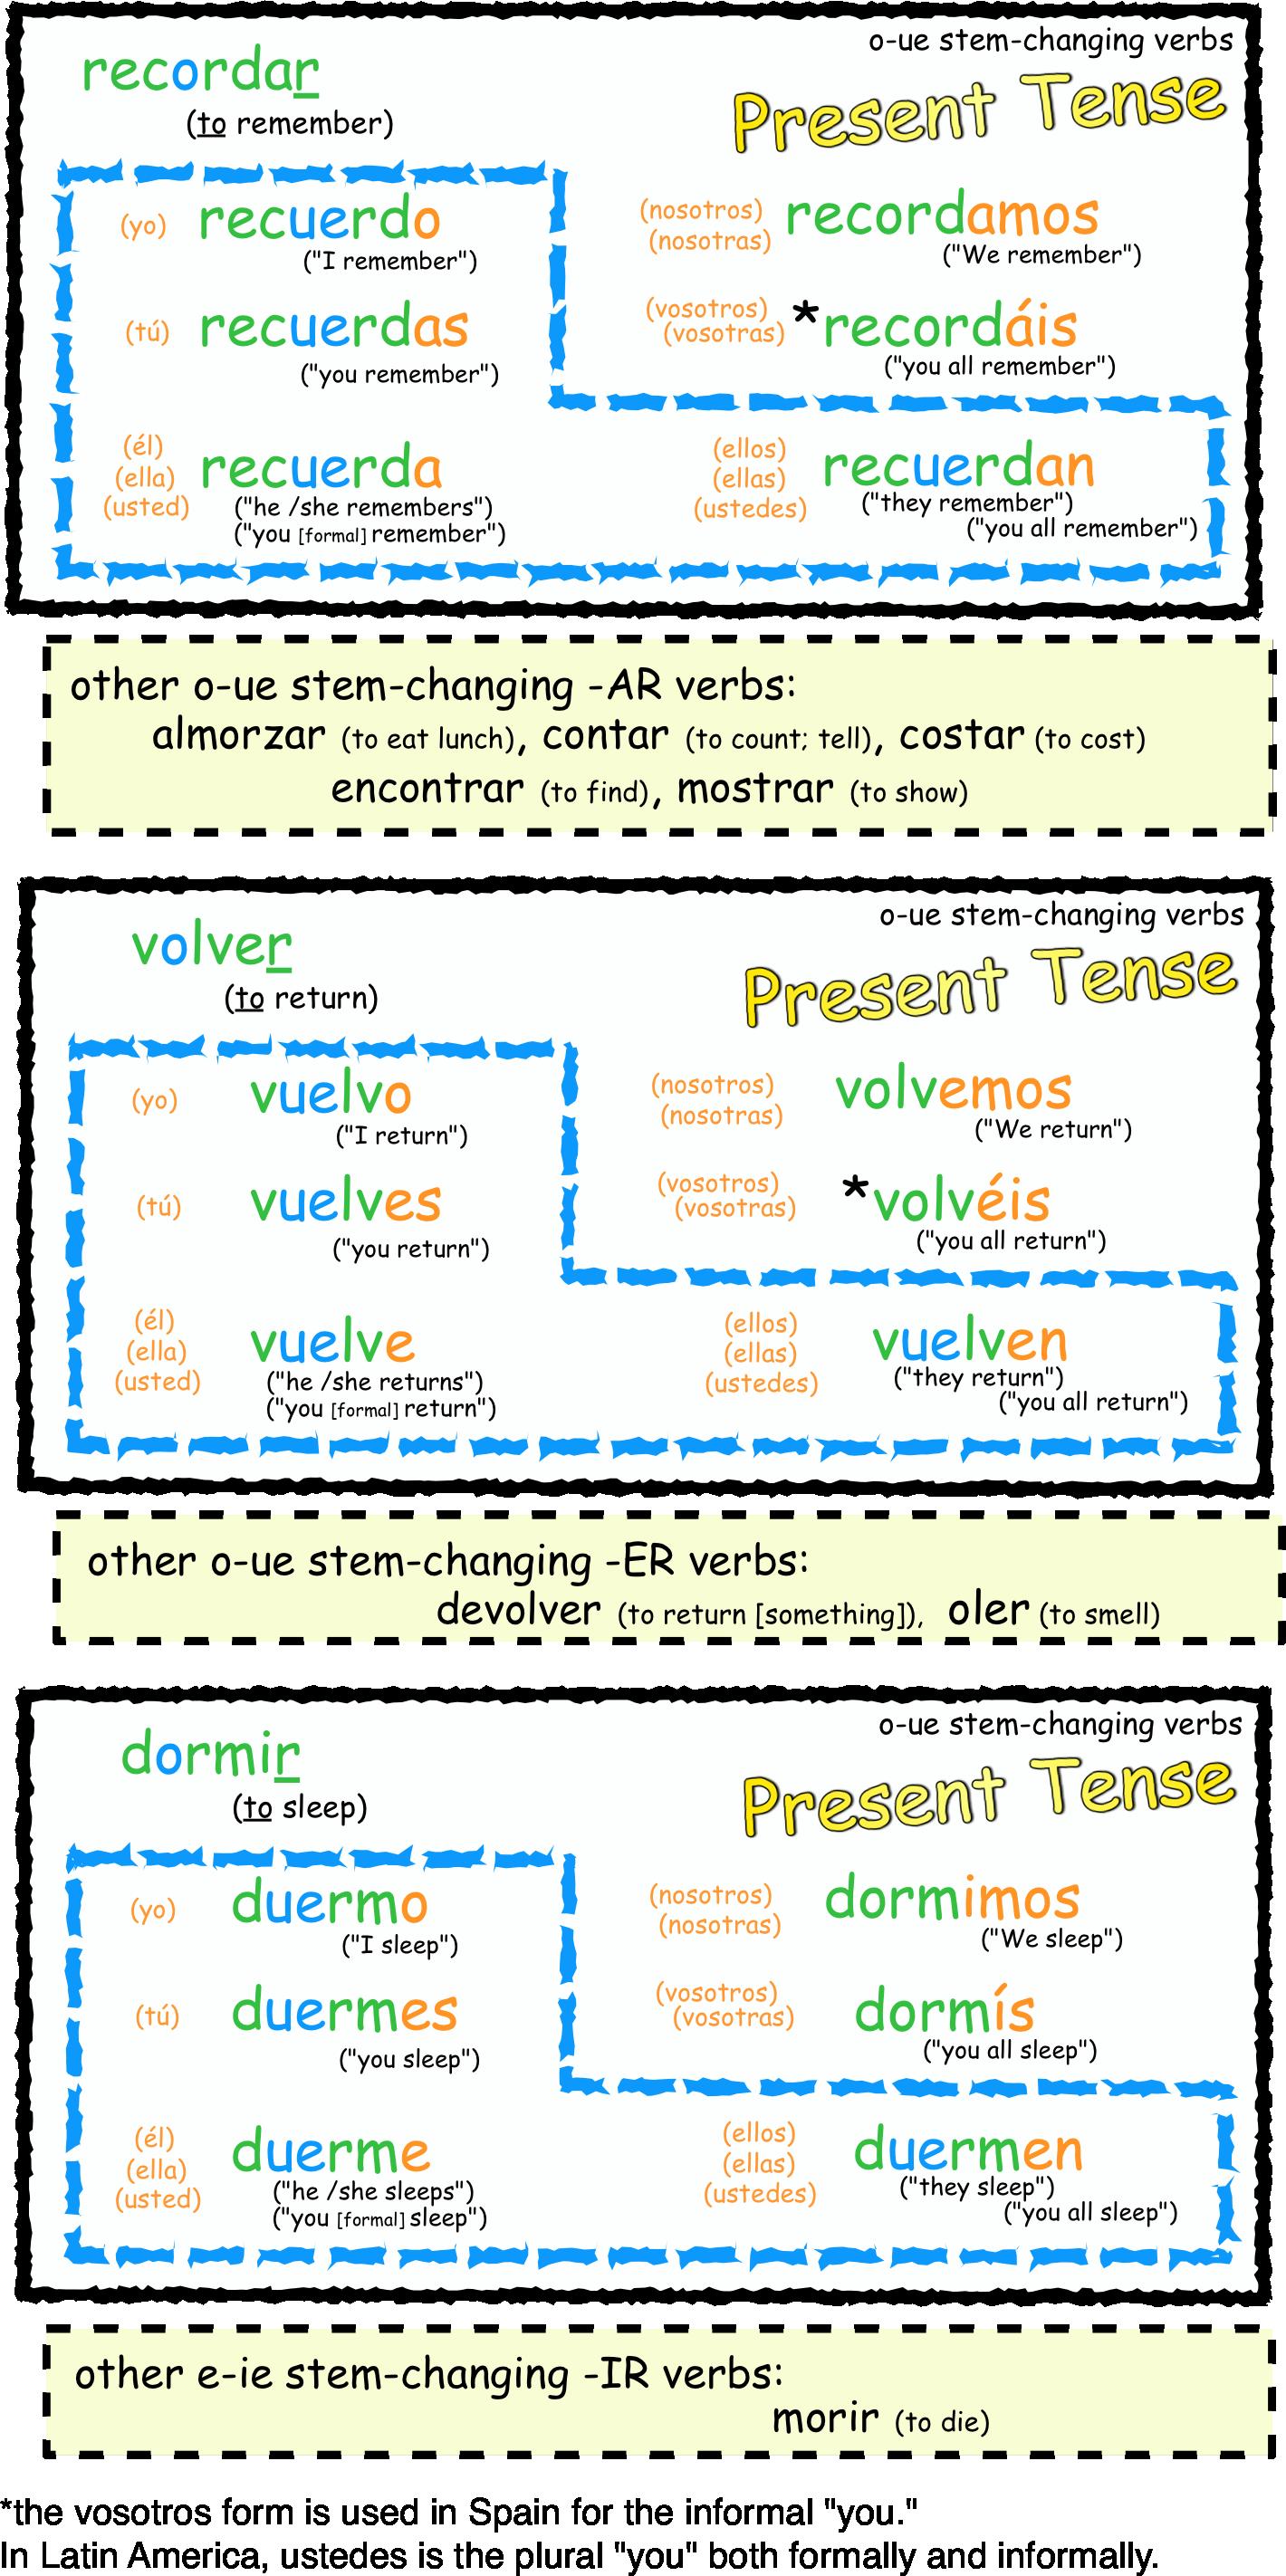 worksheet Spanish Stem Changing Verbs Worksheet spanish videos by an english speaker grammar explanations la stem changing verbs or shoe verbs